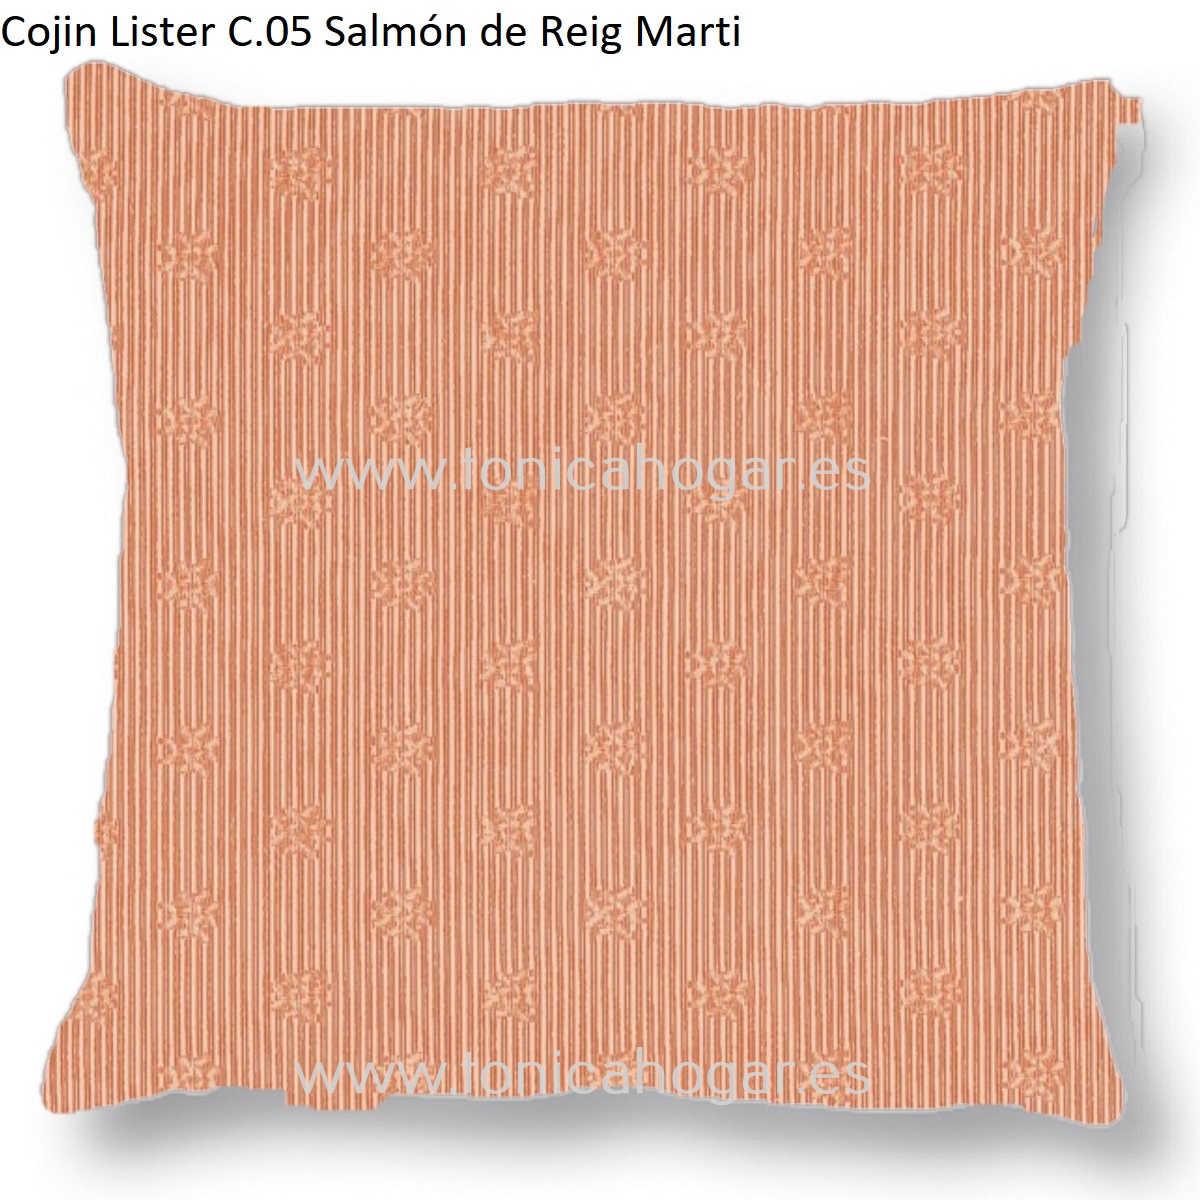 Cojín LISTER CT de Reig Marti Salmón Cojín 55x55